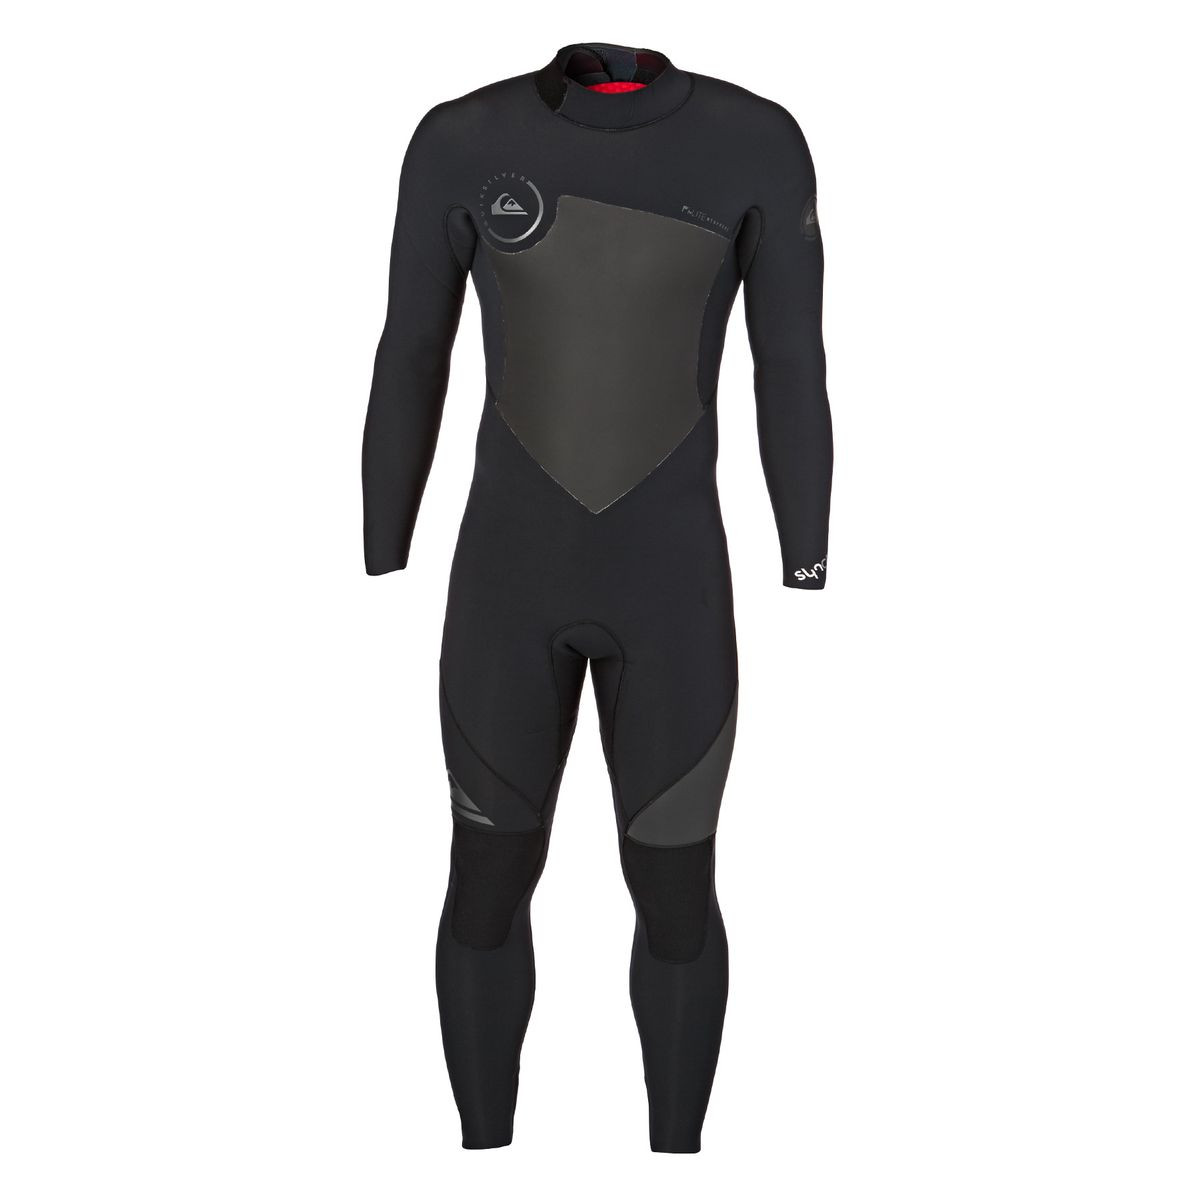 Quiksilver Syncro 4/3mm 2017 Back Zip Wetsuit - Black